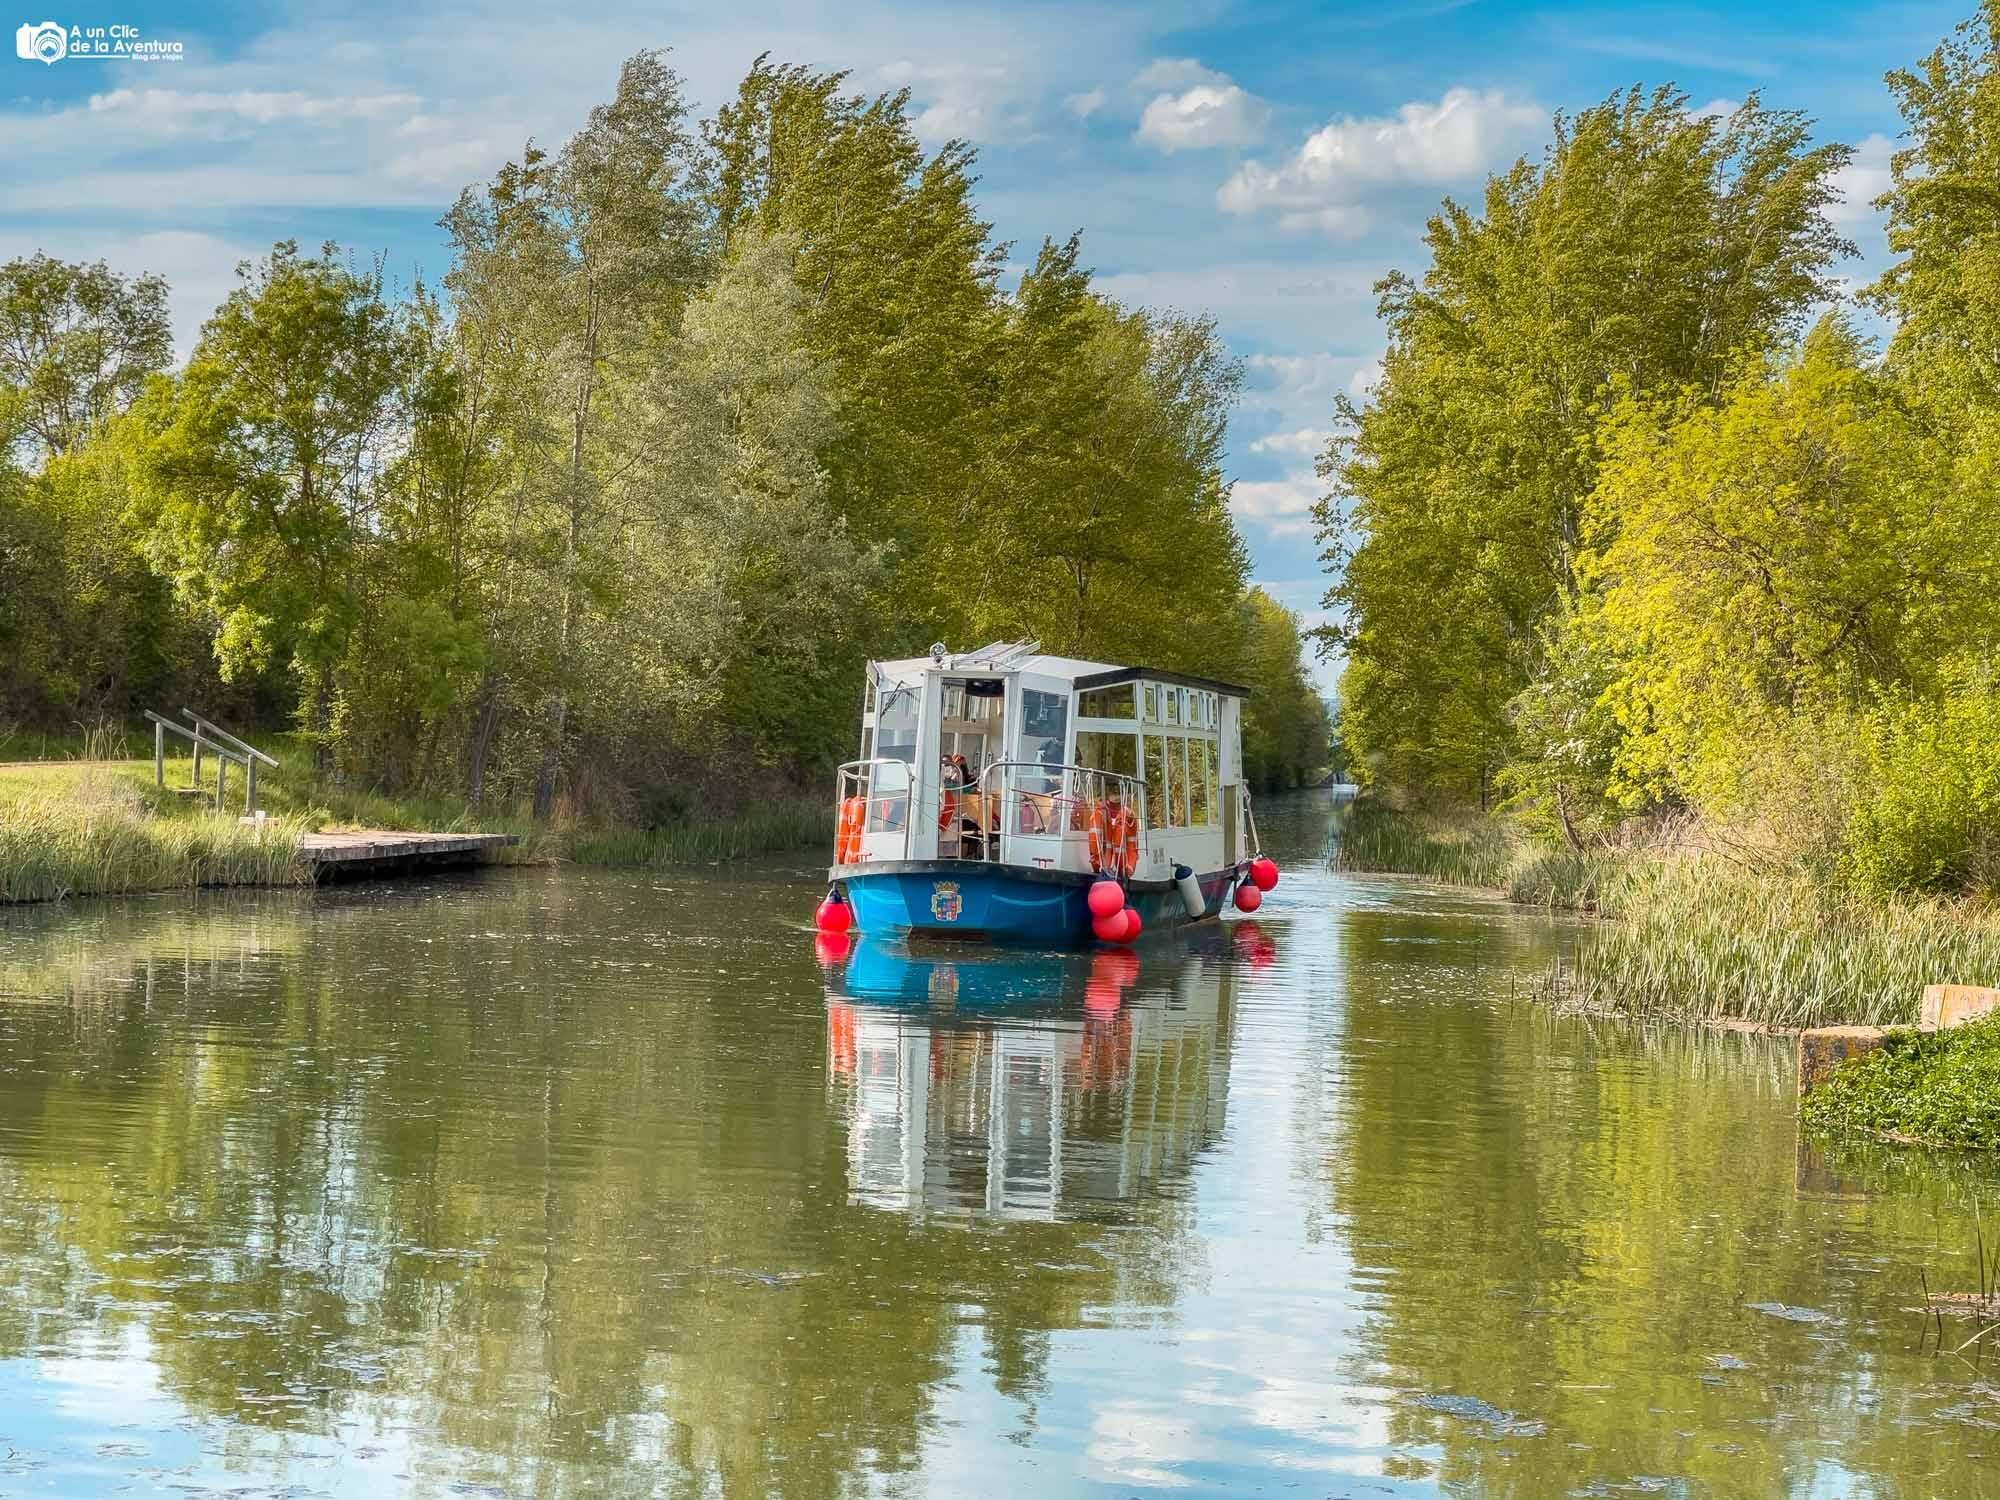 Barco Marqués de la Ensenada en el Canal de Castilla